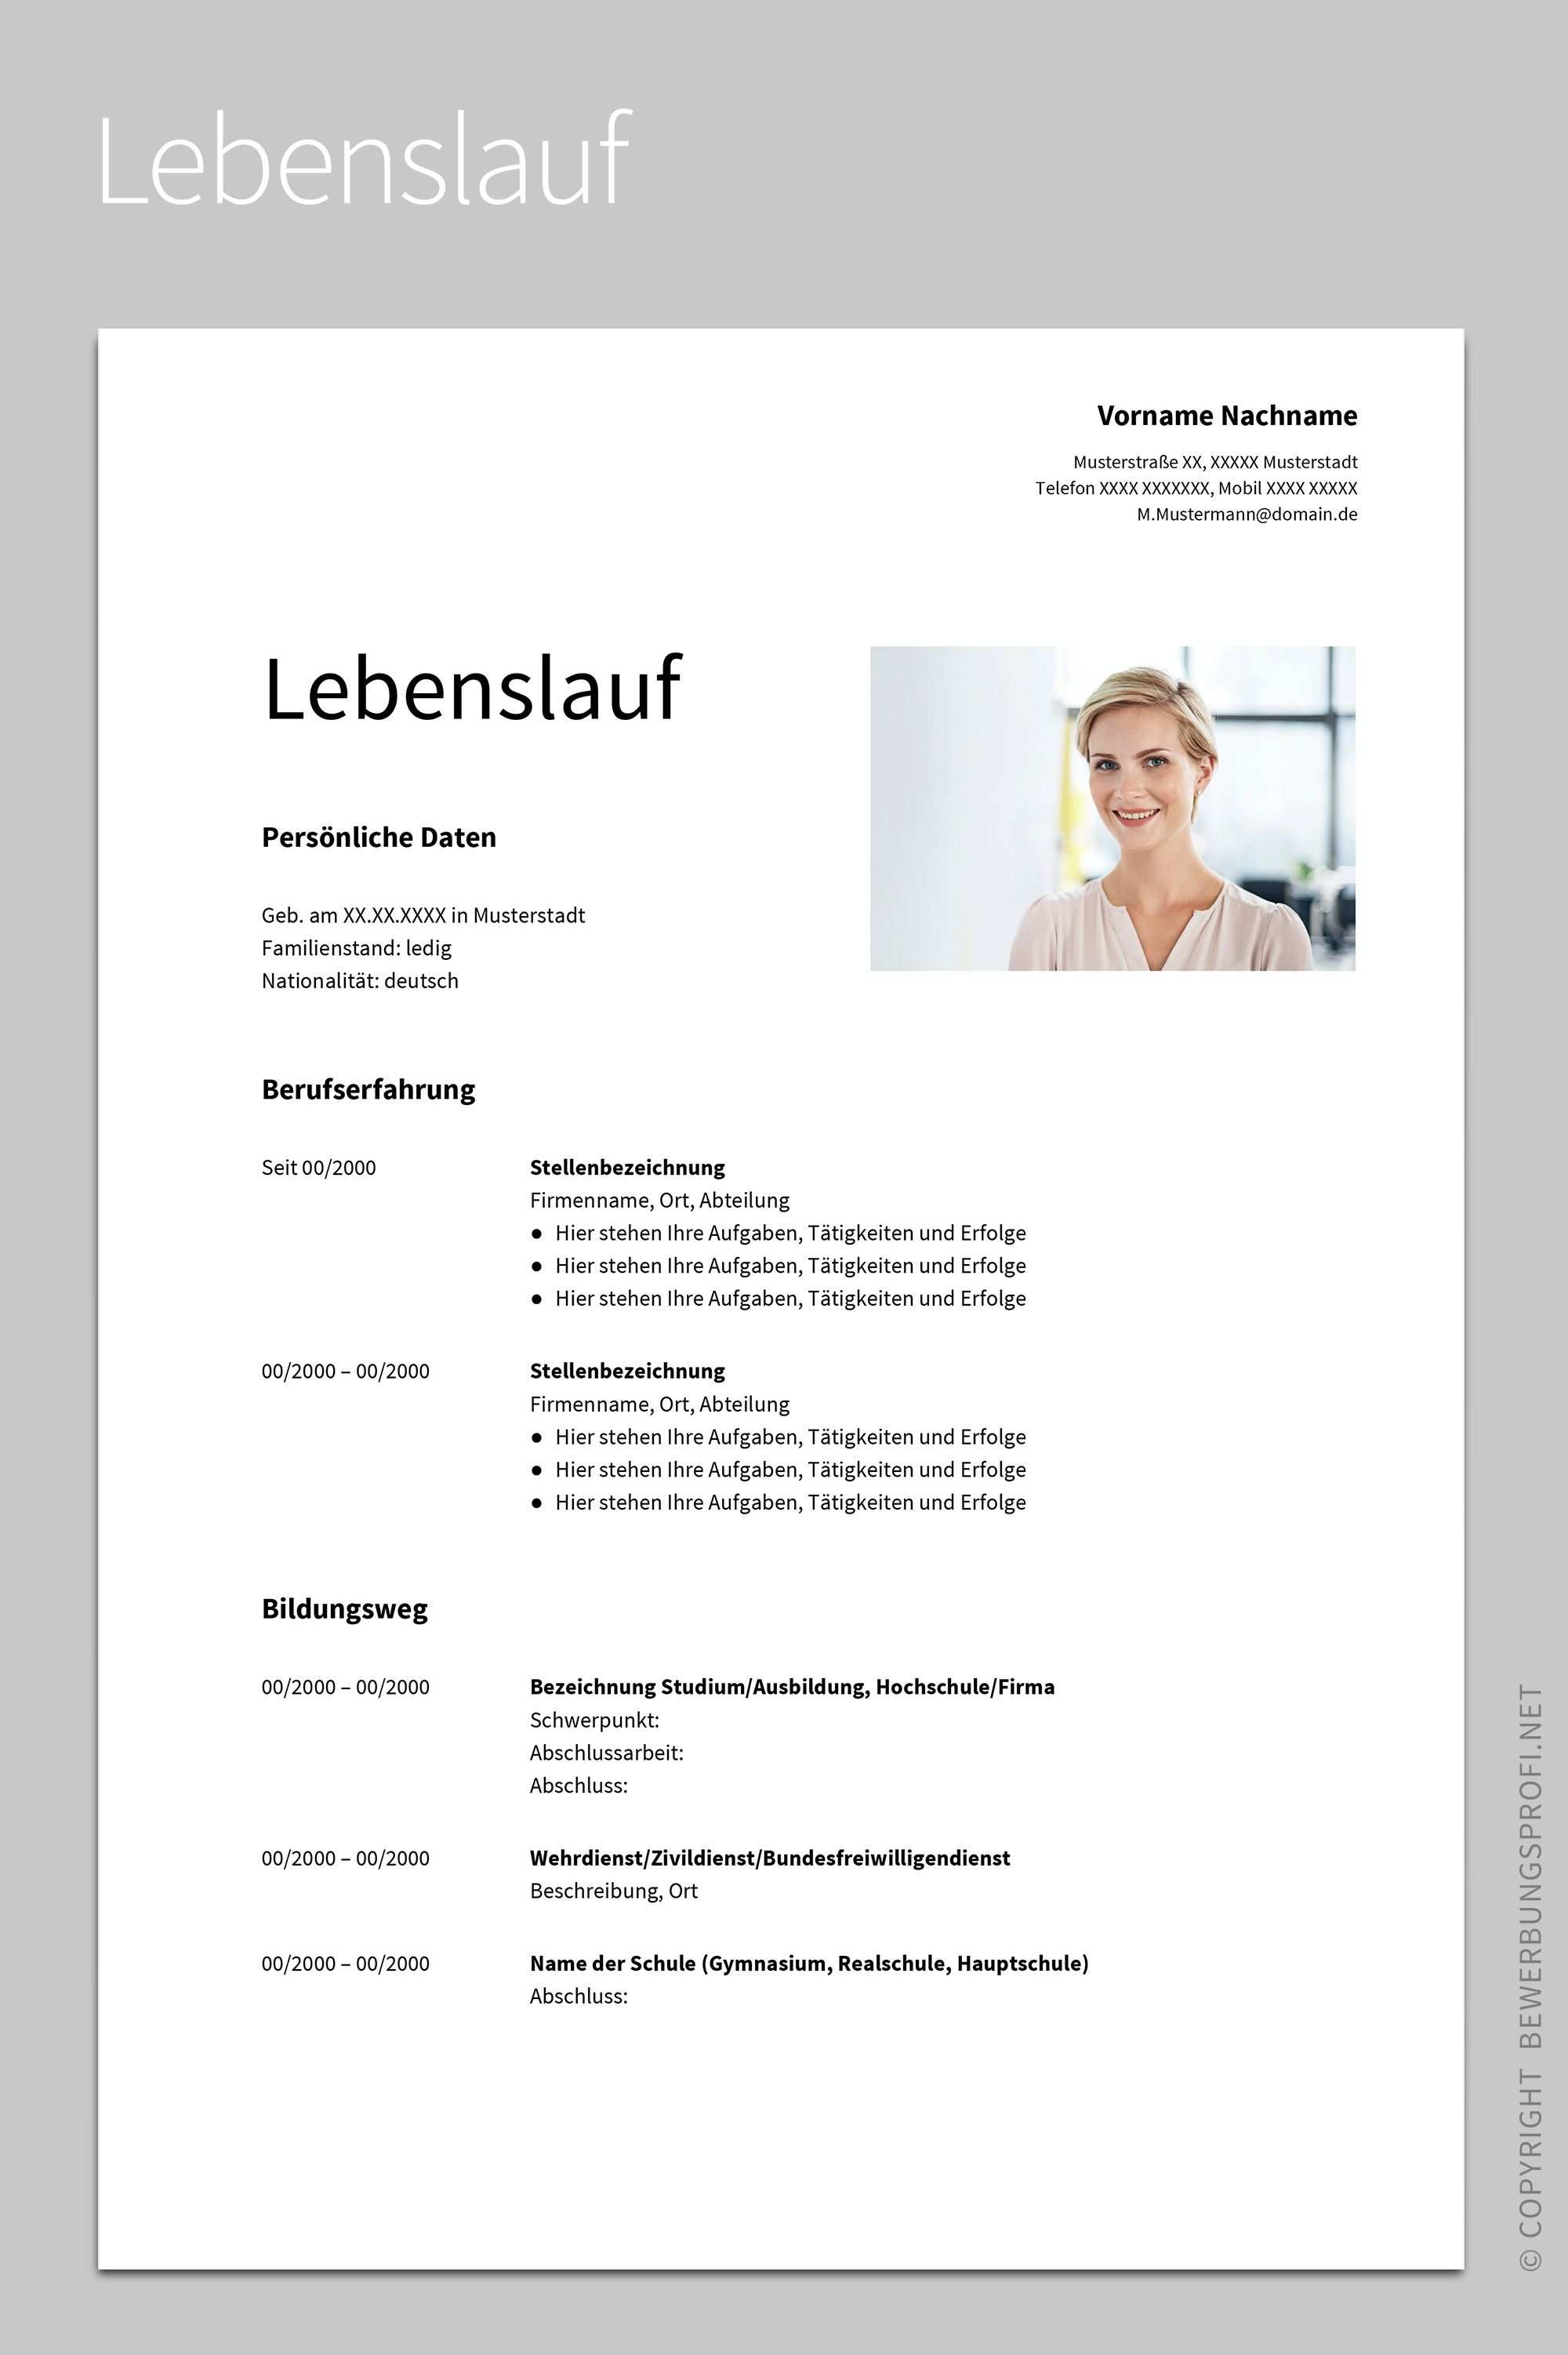 Bewerbung Albus 2020 Lebenslauf Lebenslauf Design Lebenslauf